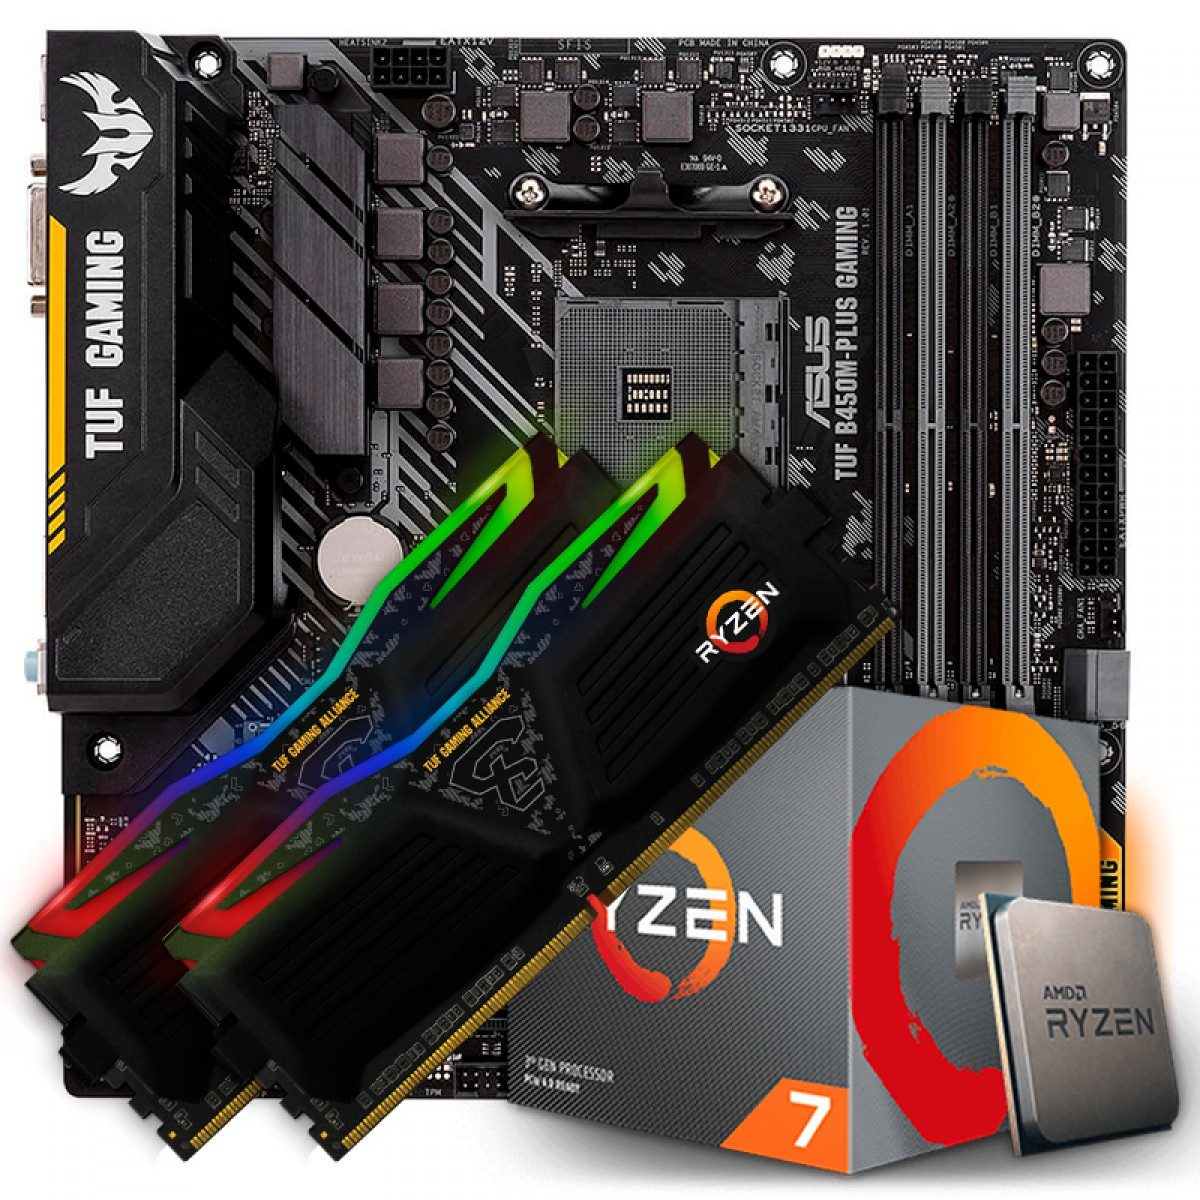 Kit Upgrade Placa Mãe Asus TUF B450M-PLUS GAMING, AMD AM4 + Processador AMD Ryzen 7 3700x 3.6GHz + Memória TUF DDR4 16GB (2x8GB) 3000MHz